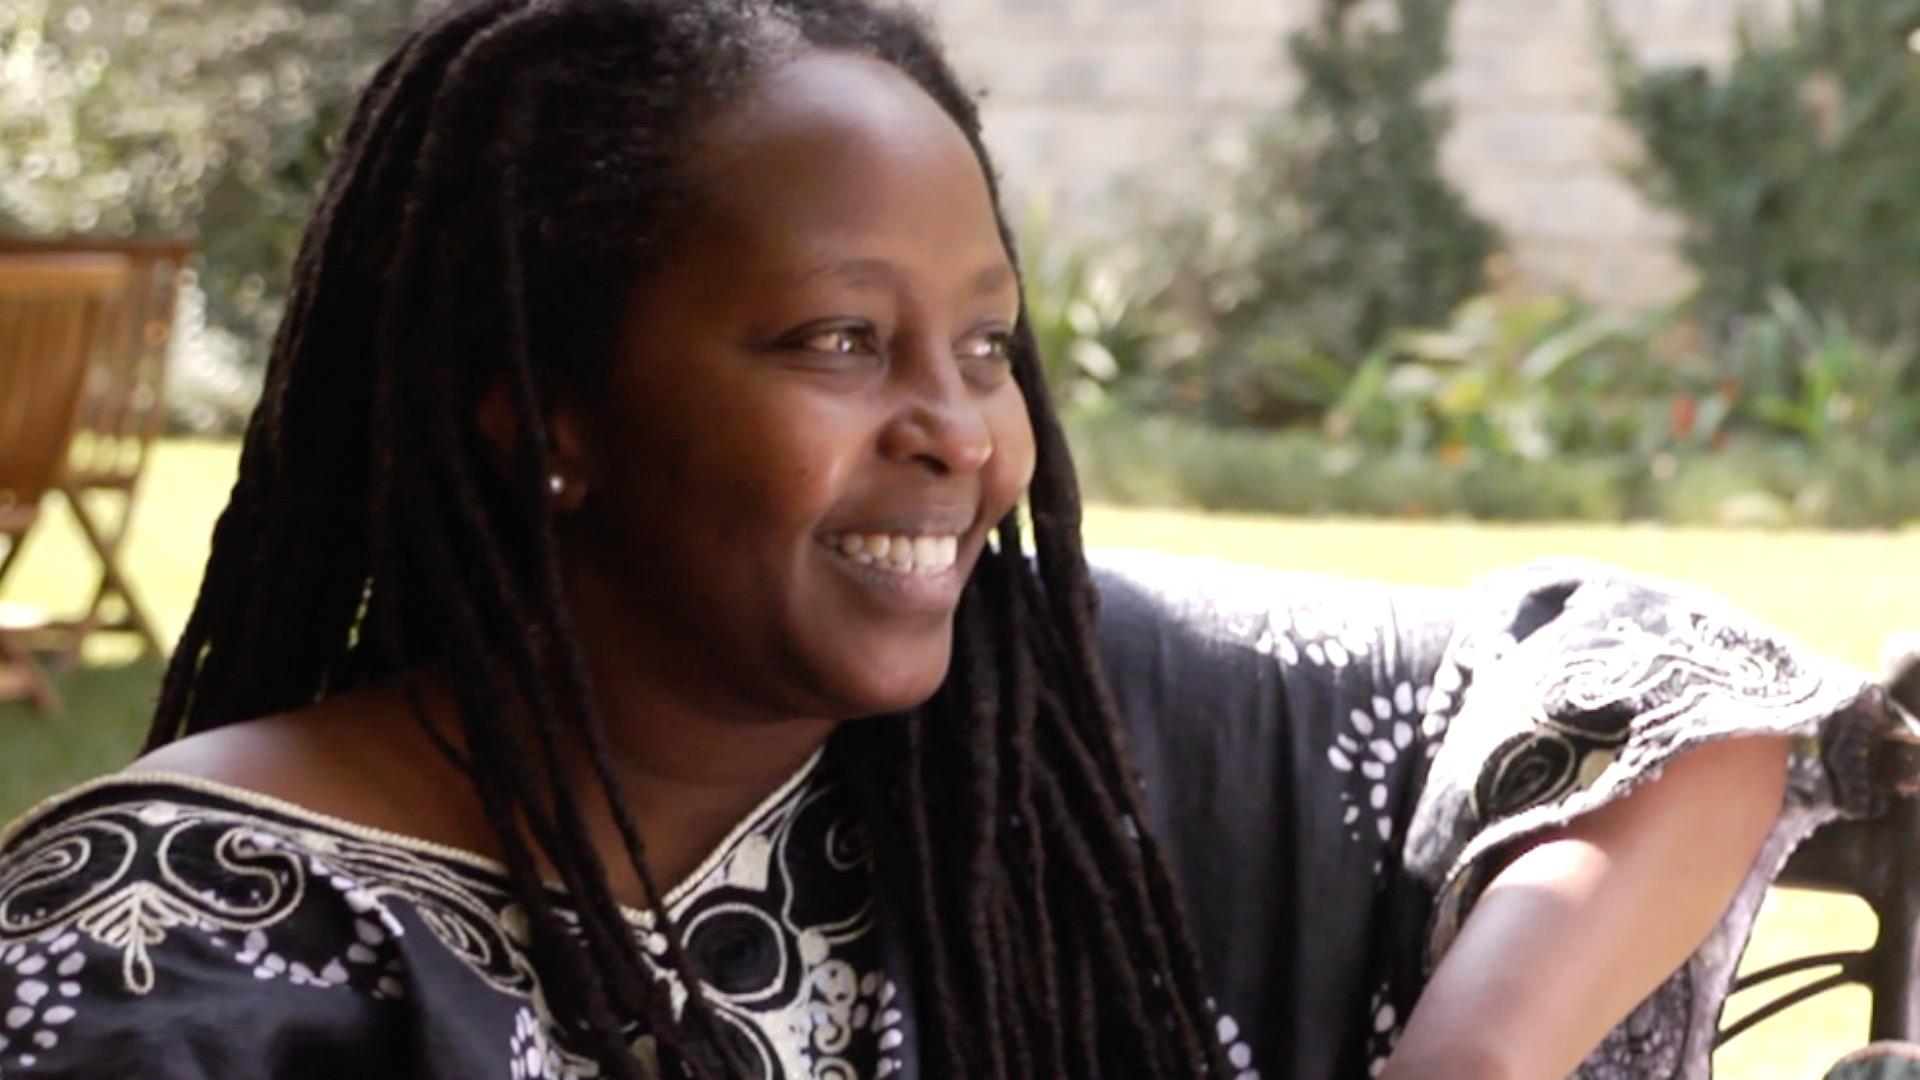 joy kiano of murangi homes during when interview with david roy in nairobi kenya